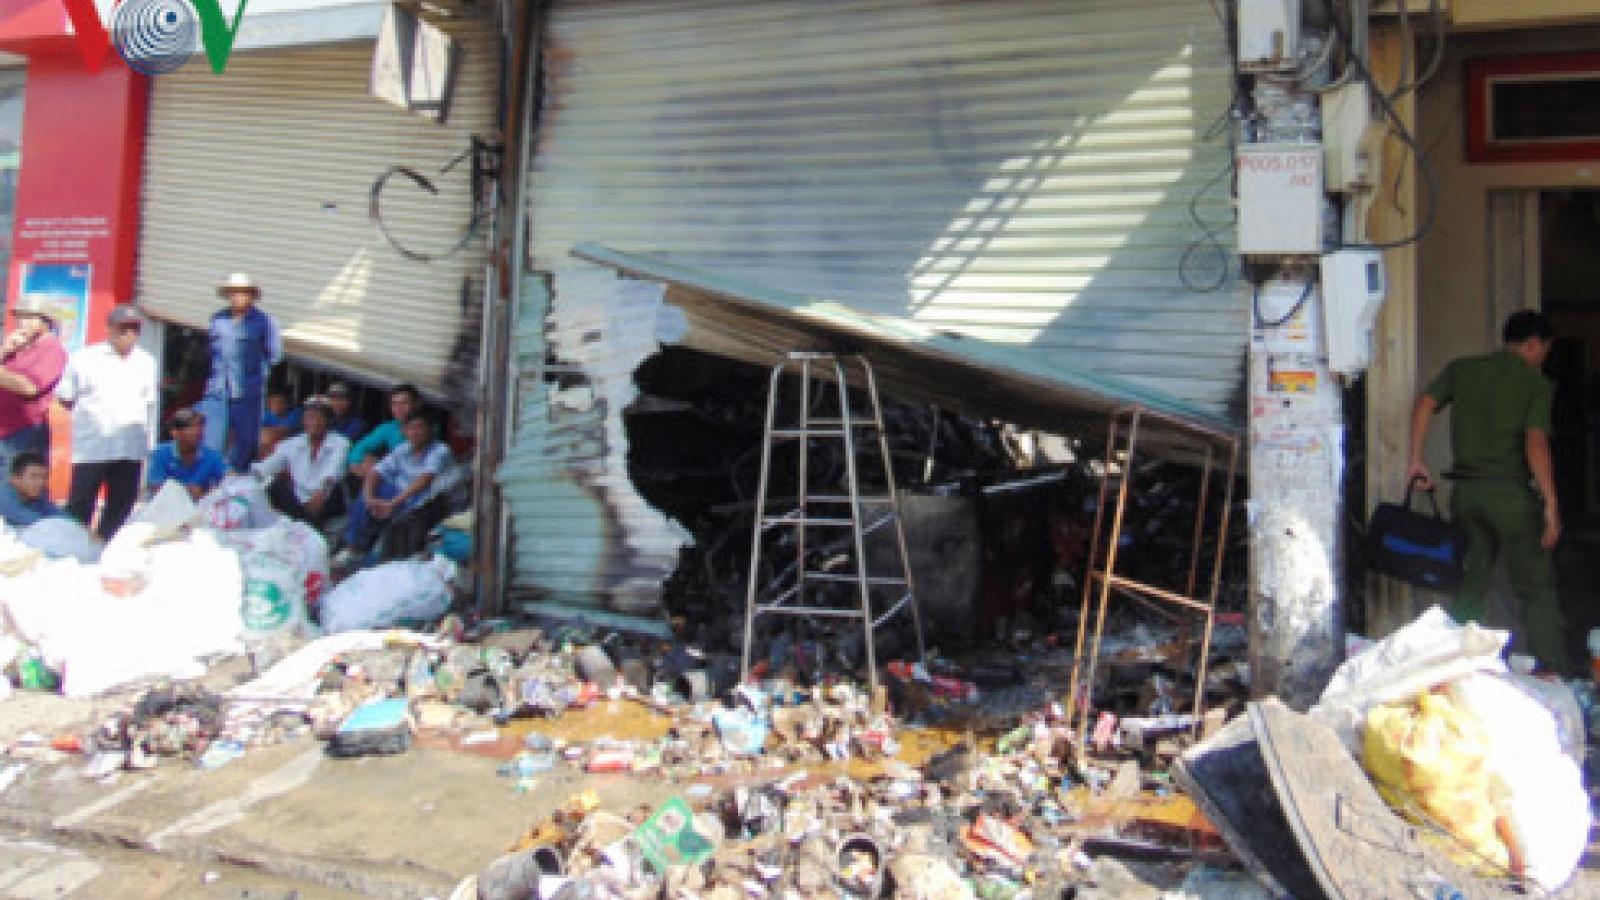 4-alarm fire damages 3 businesses in Bac Lieu Province